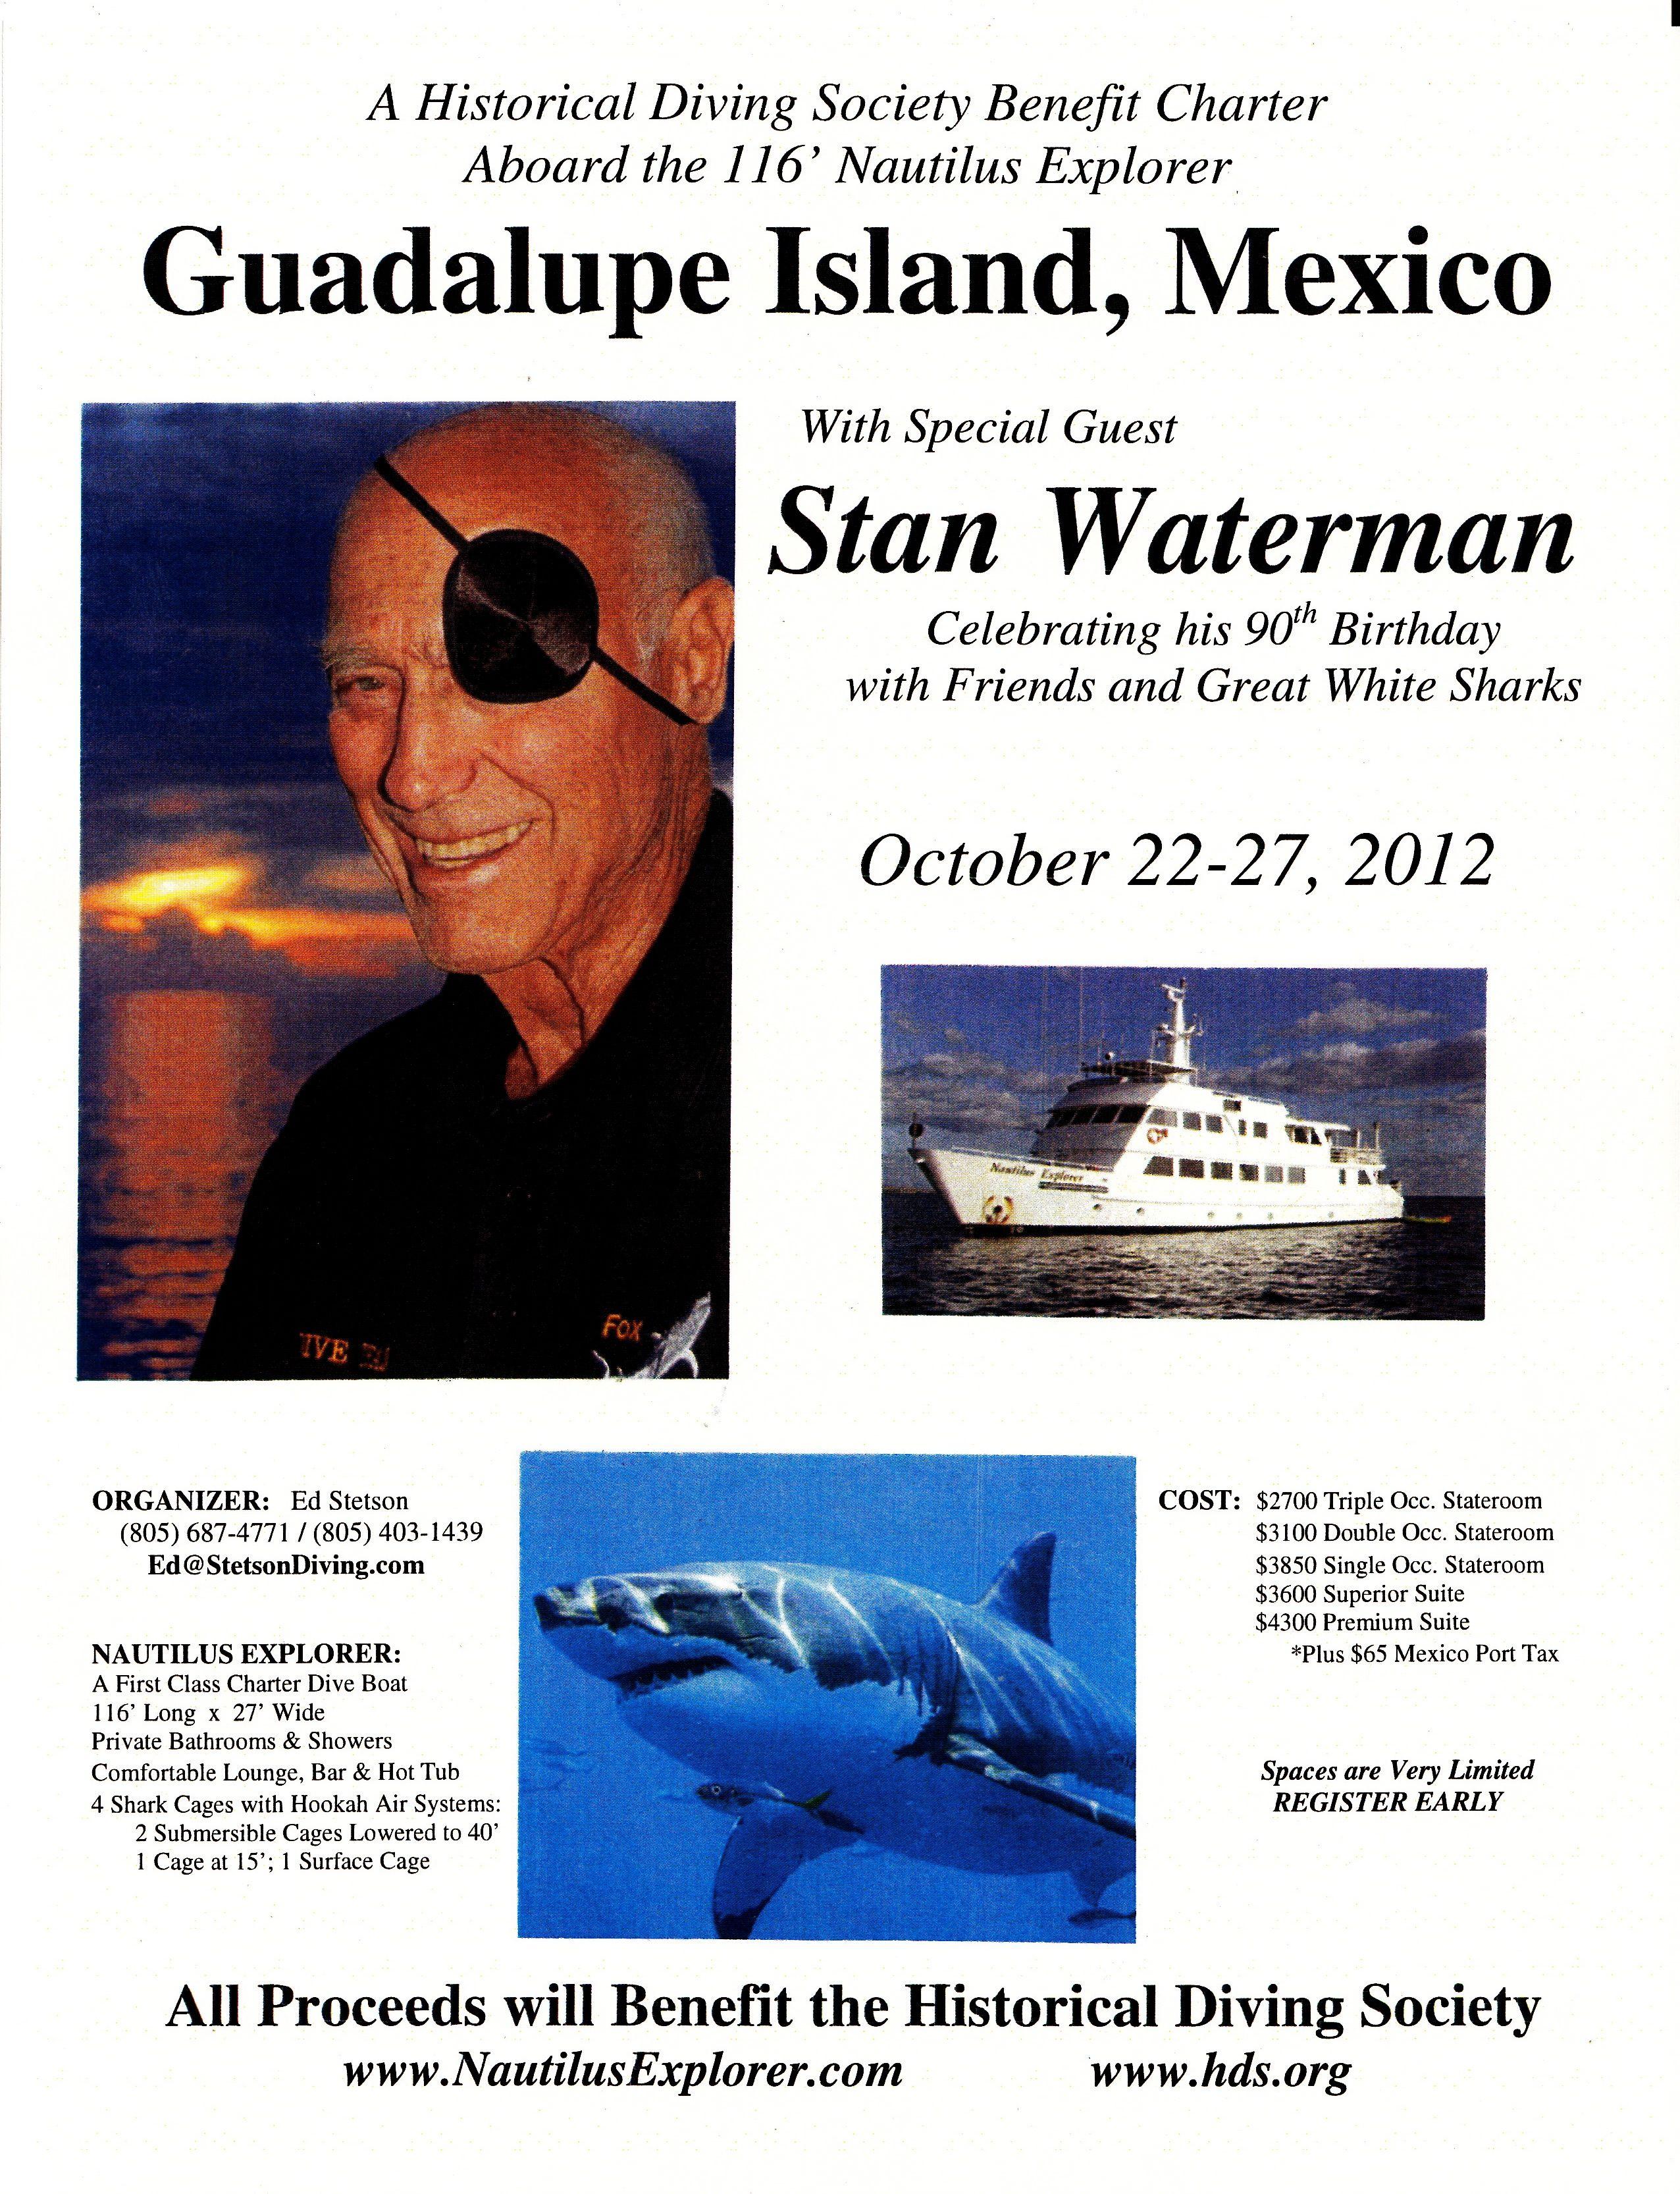 Stan Waterman Legendary Underwater Film Maker Producer Shark Conservationist Sup Radio Show Waterman Shark Underwater